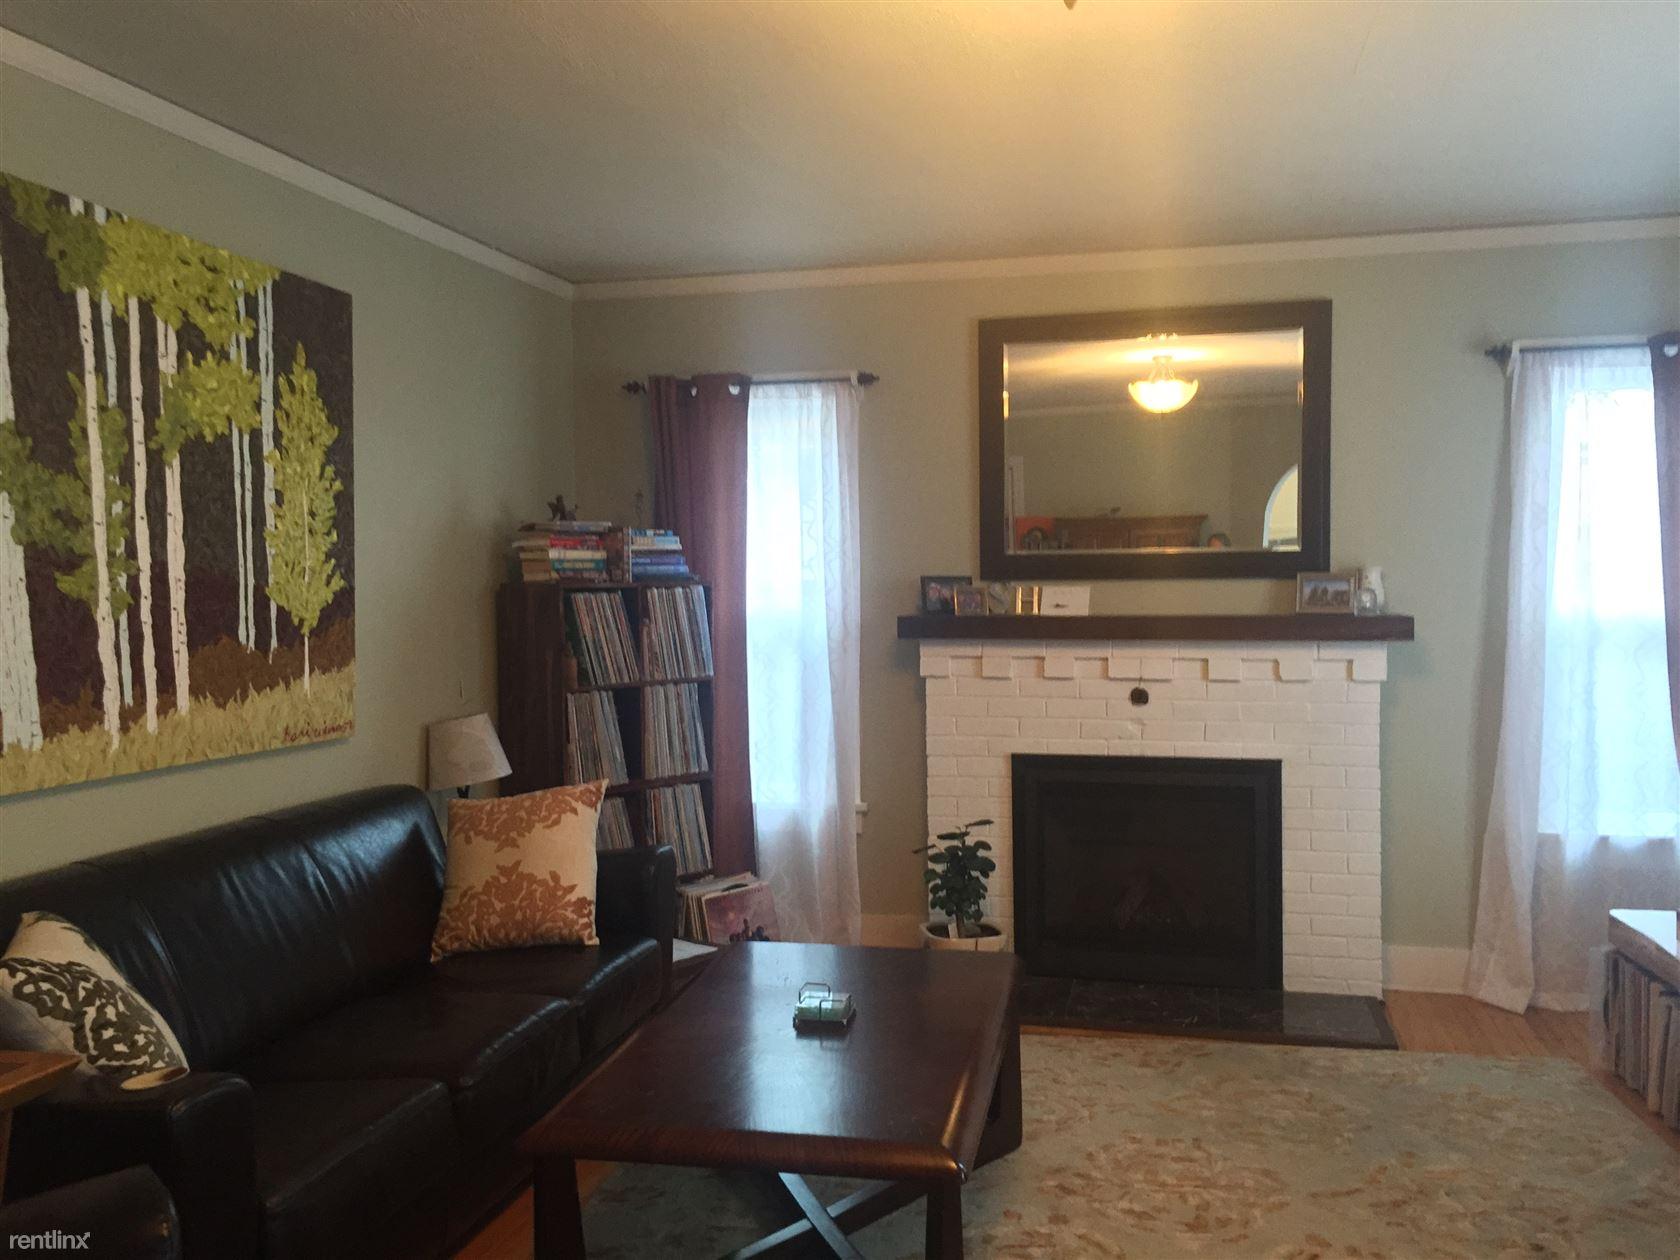 f living room 2